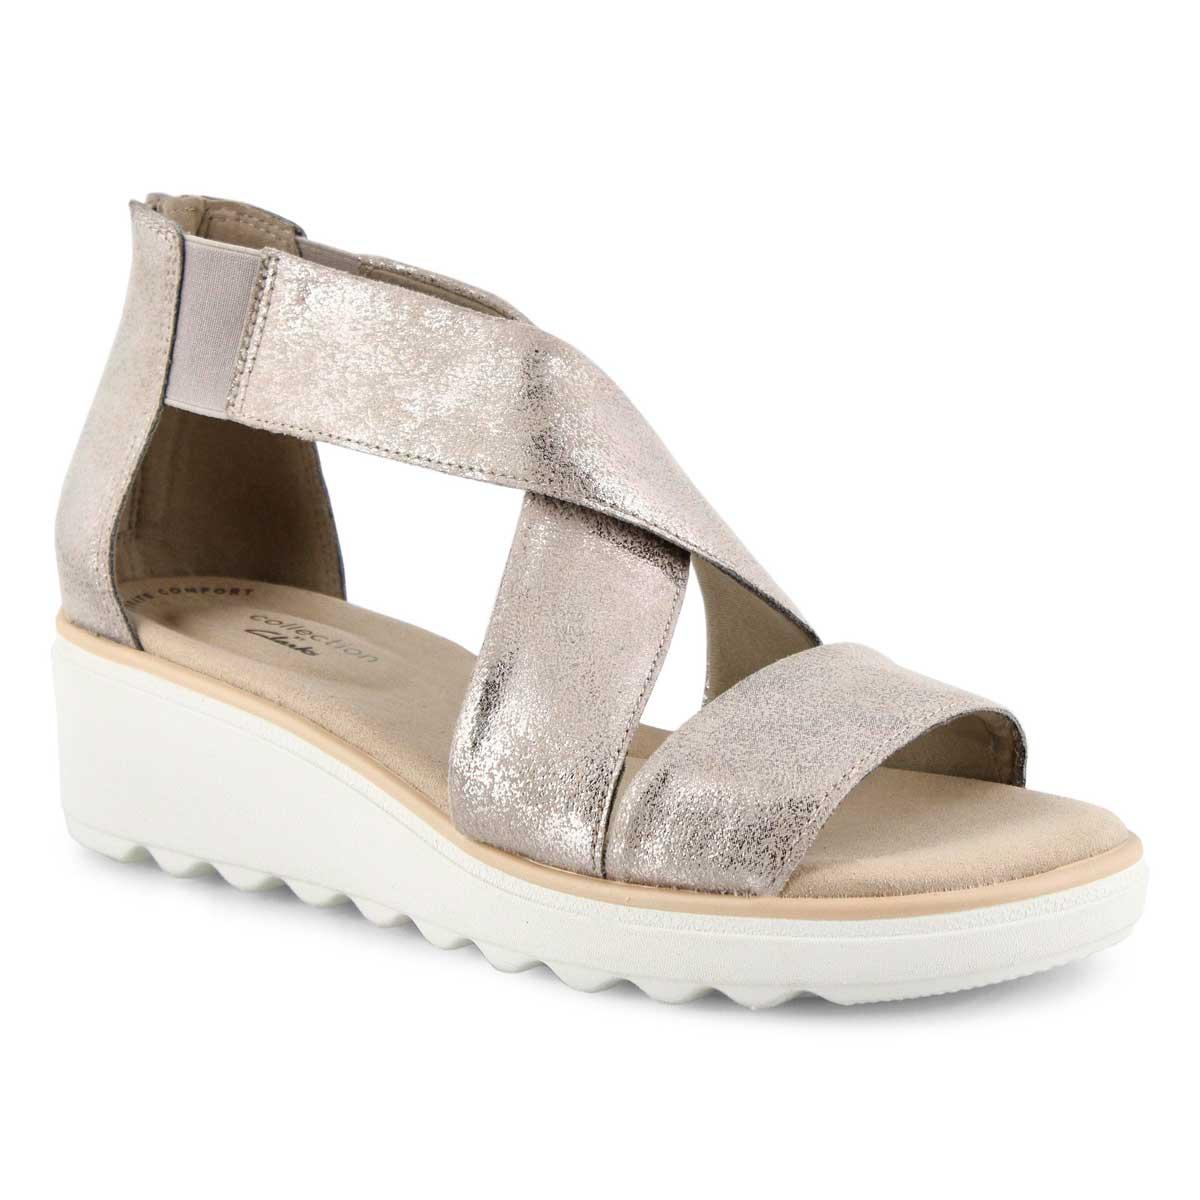 Lds Jillian Rise pewter wedge sandal